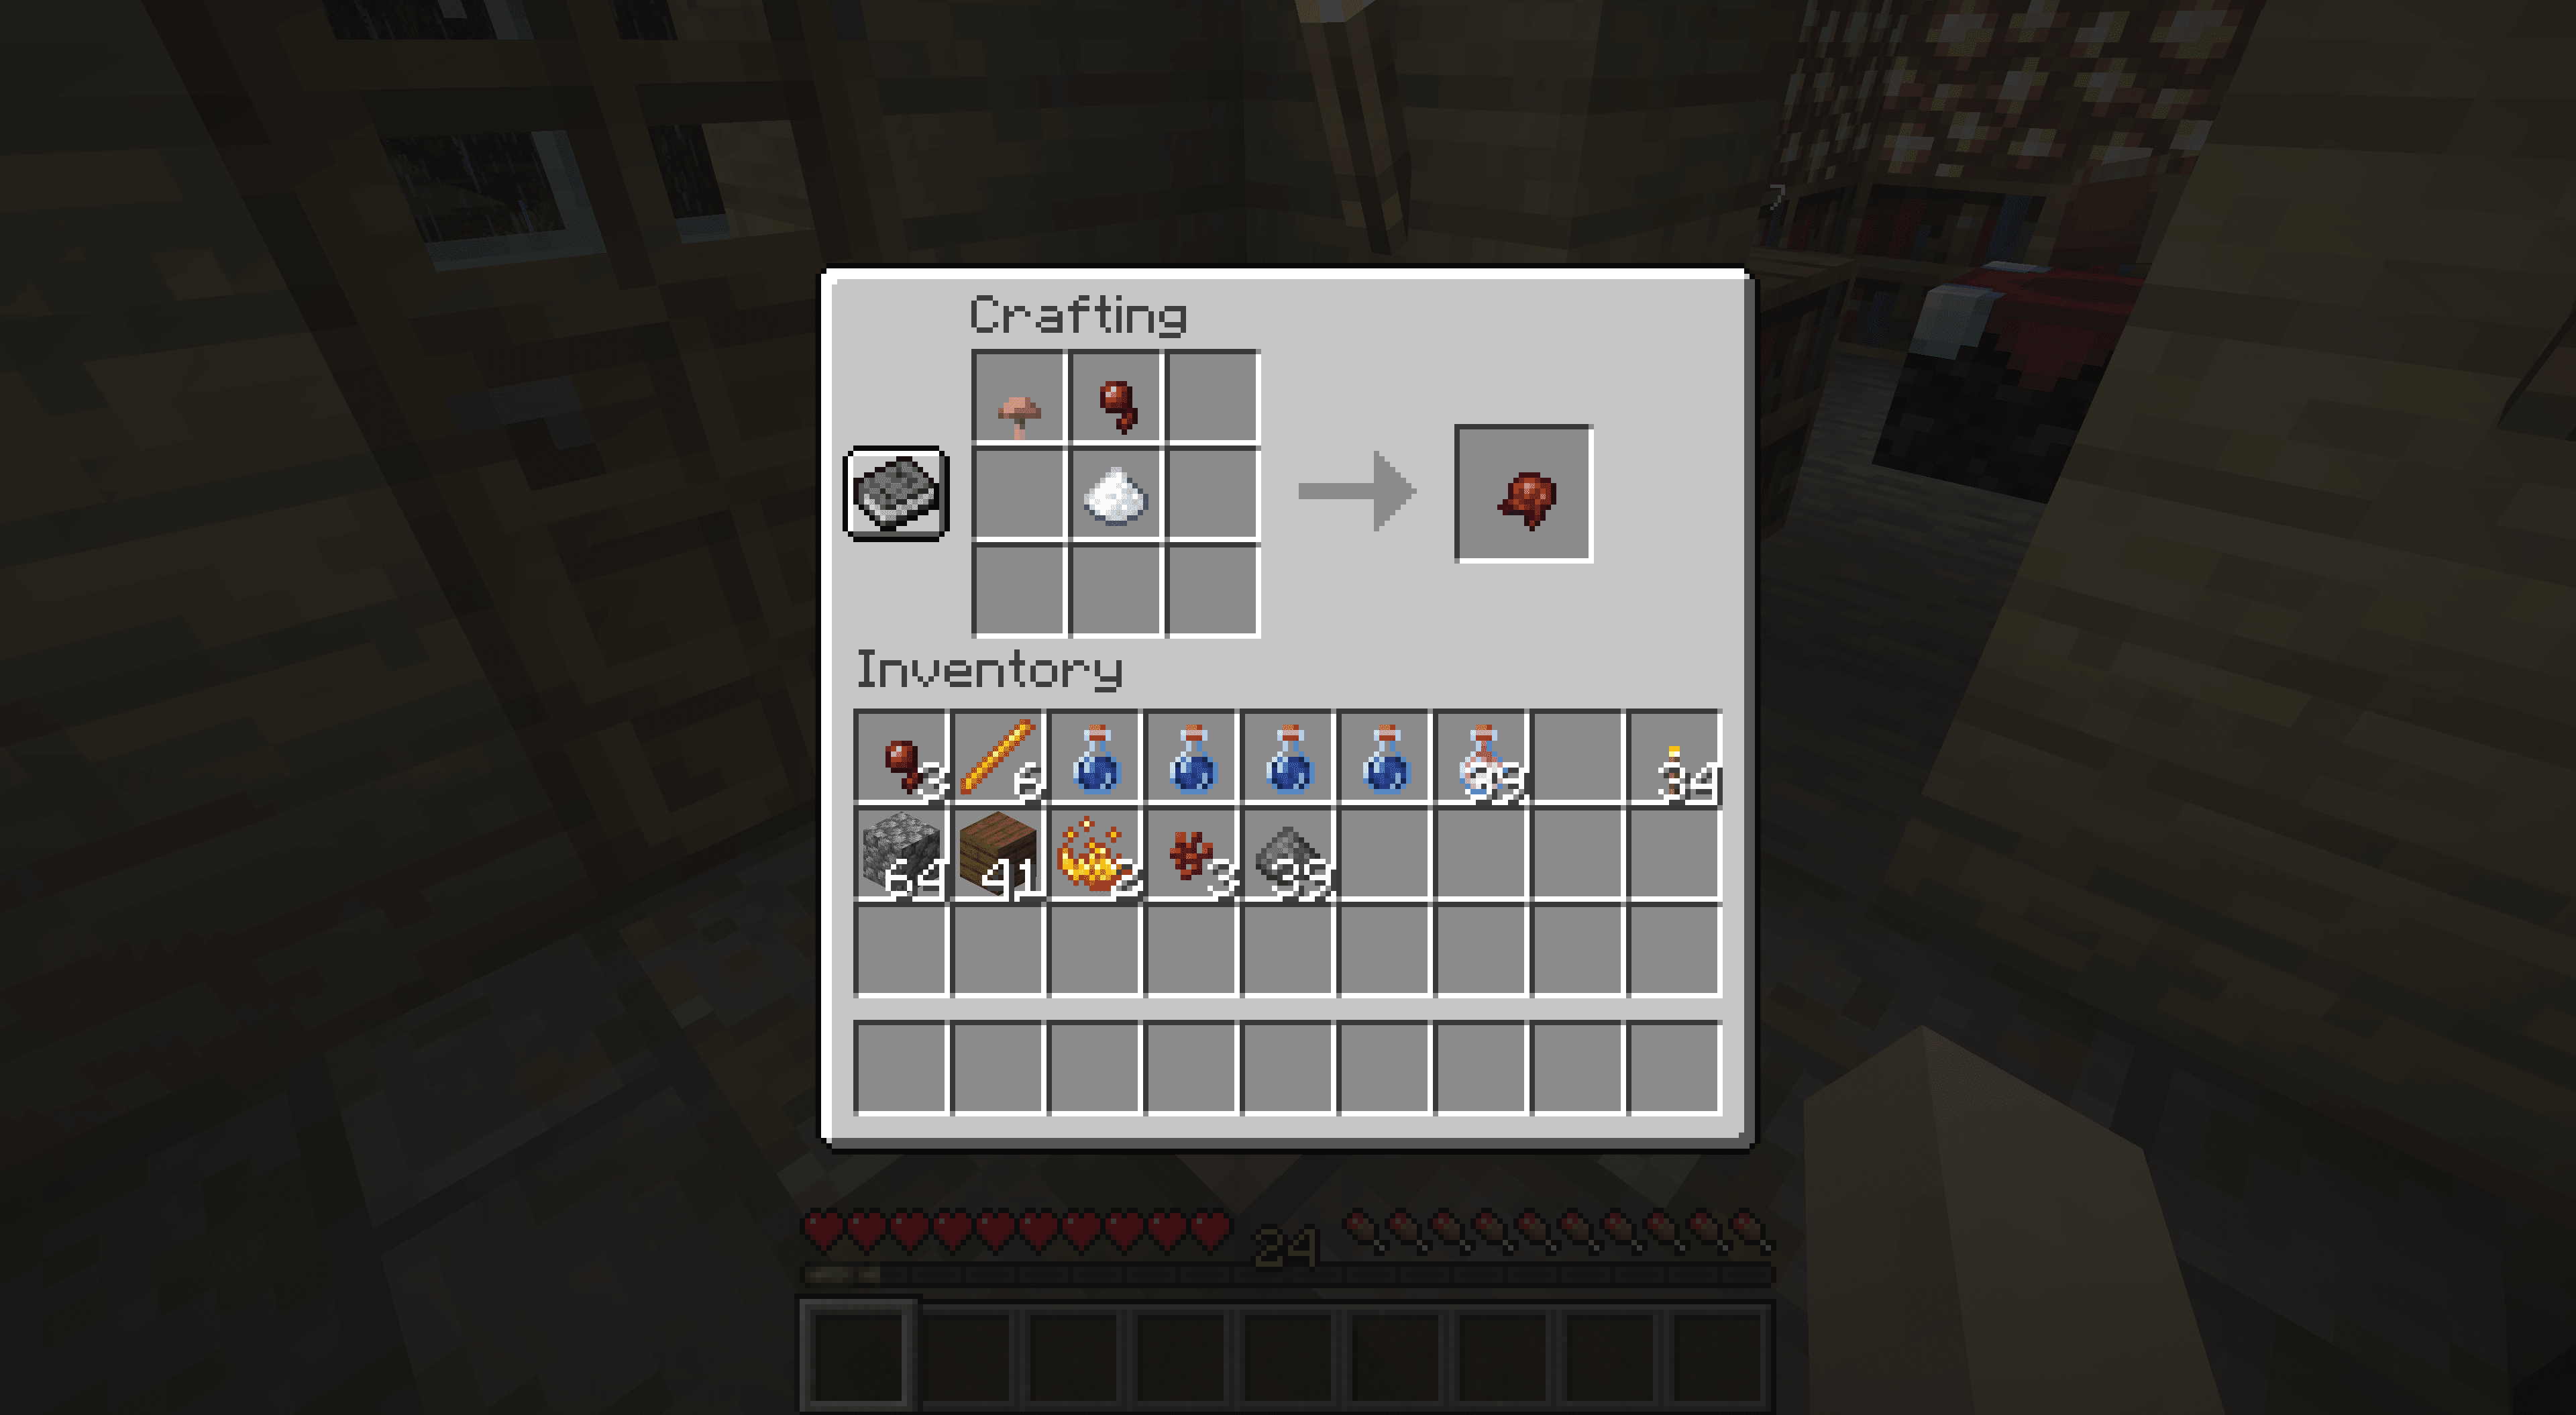 Crafting a fermented spider eye in Minecraft.